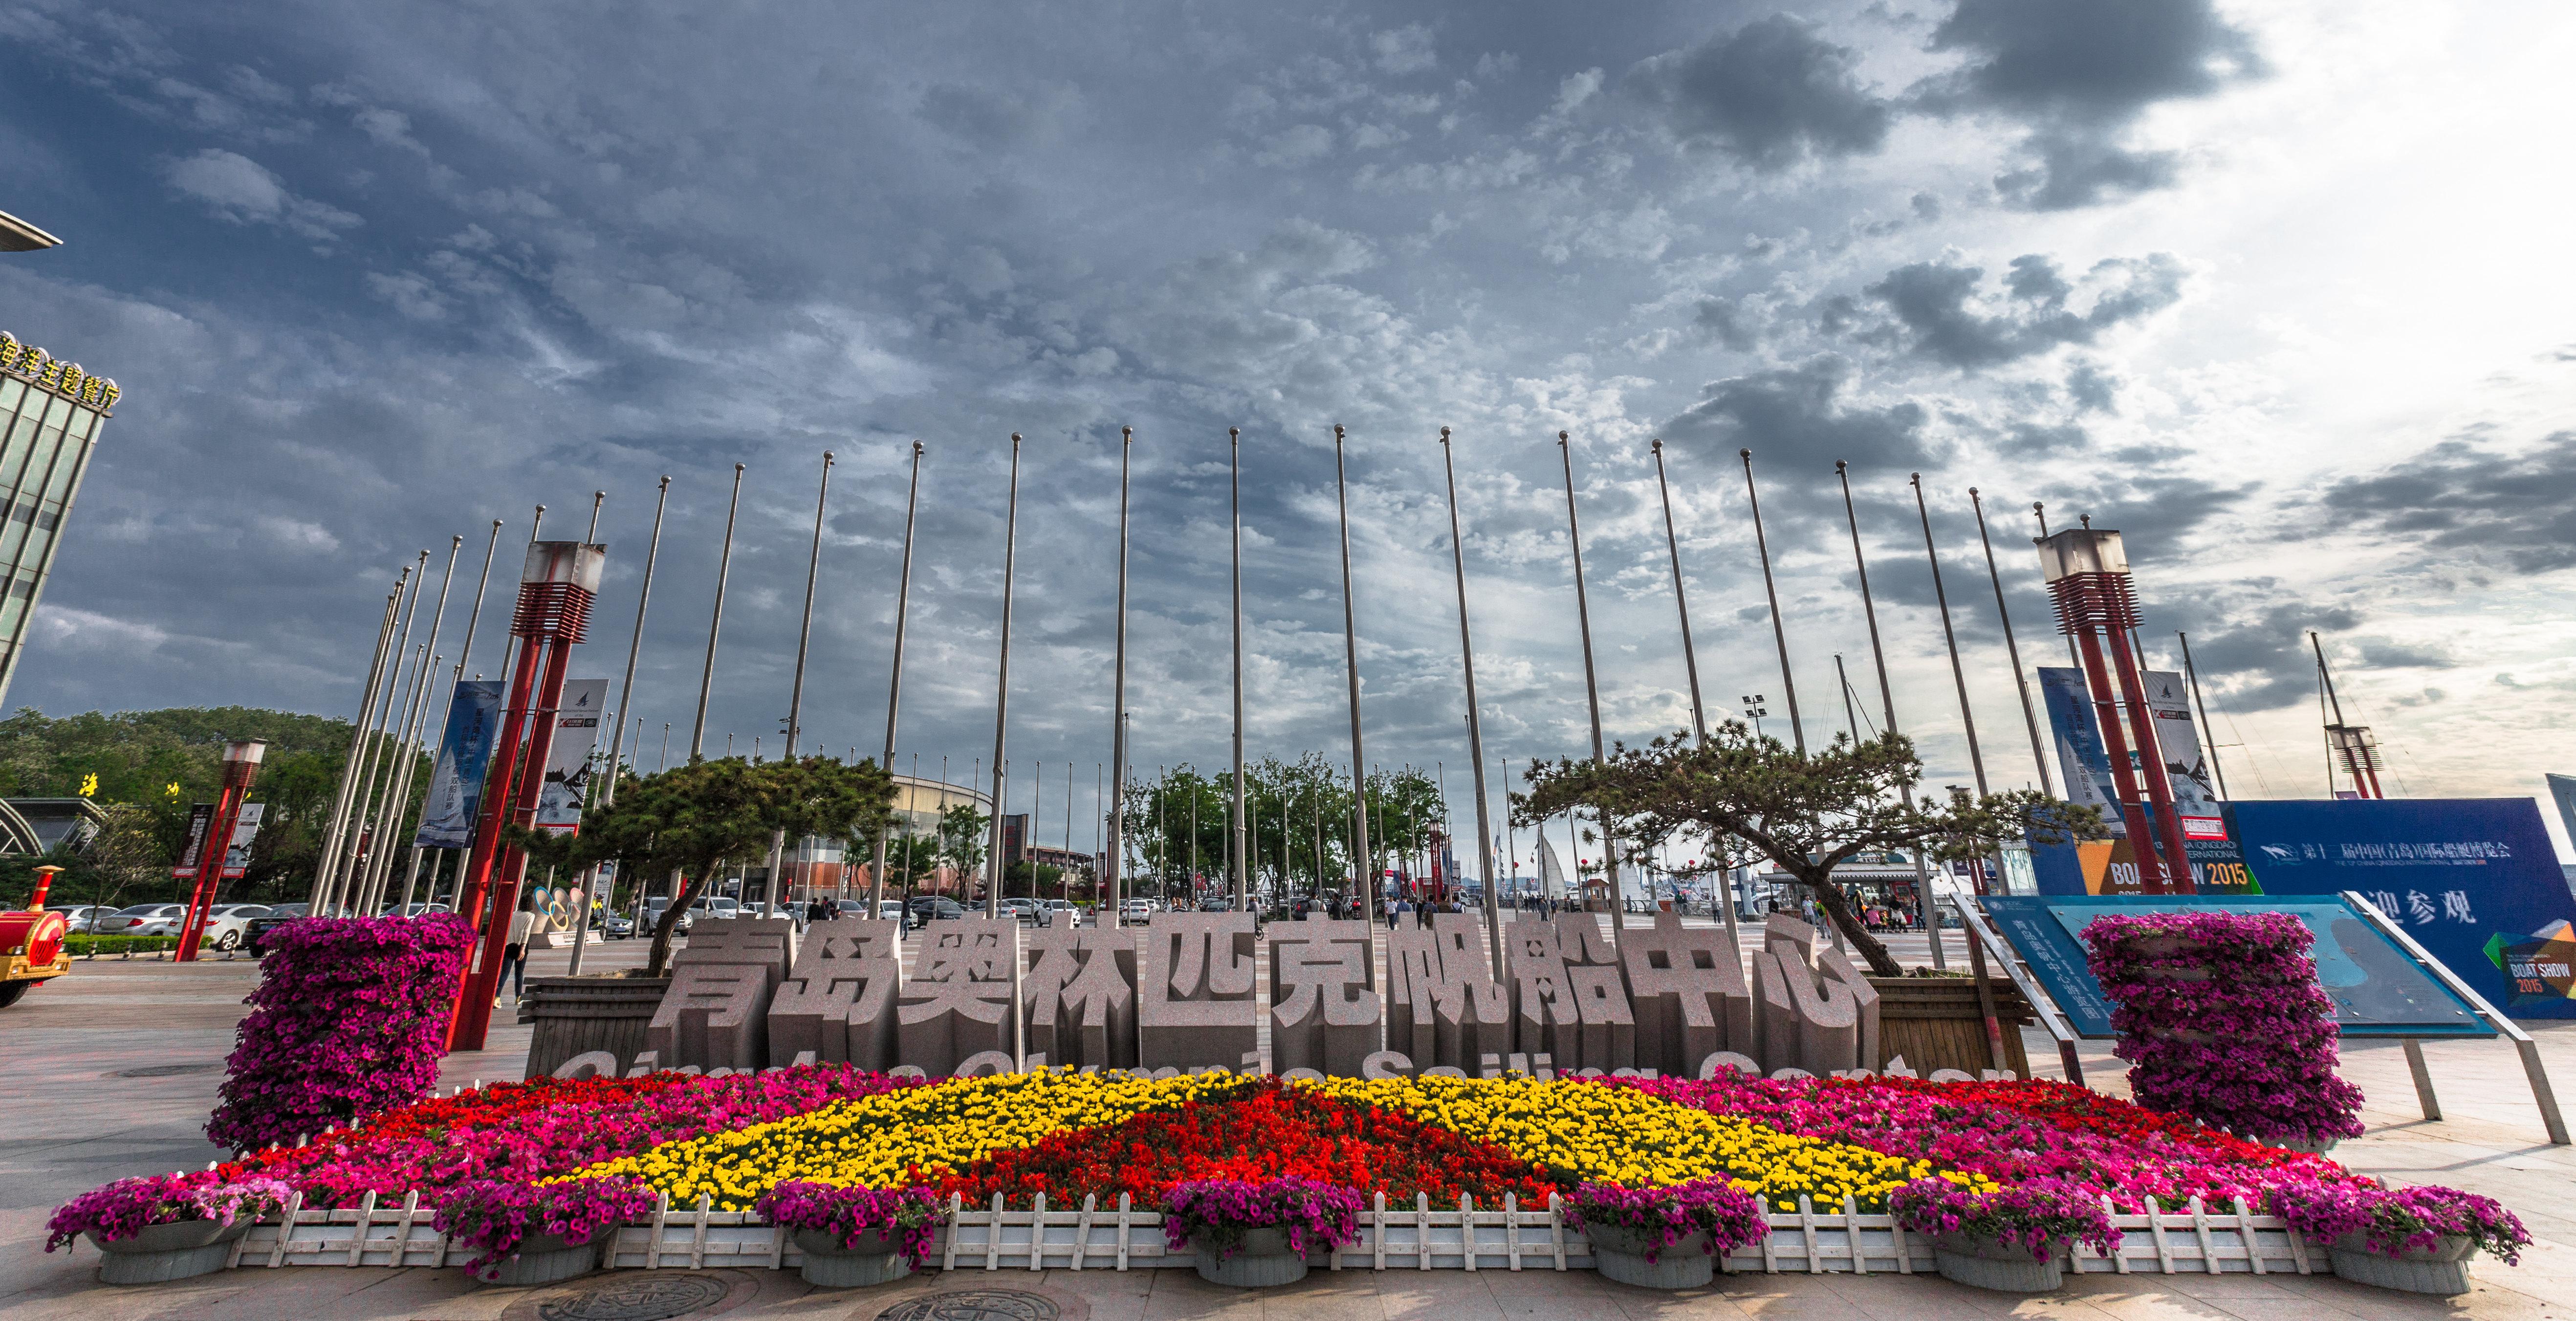 Qingdao International Sailing Center Ticket